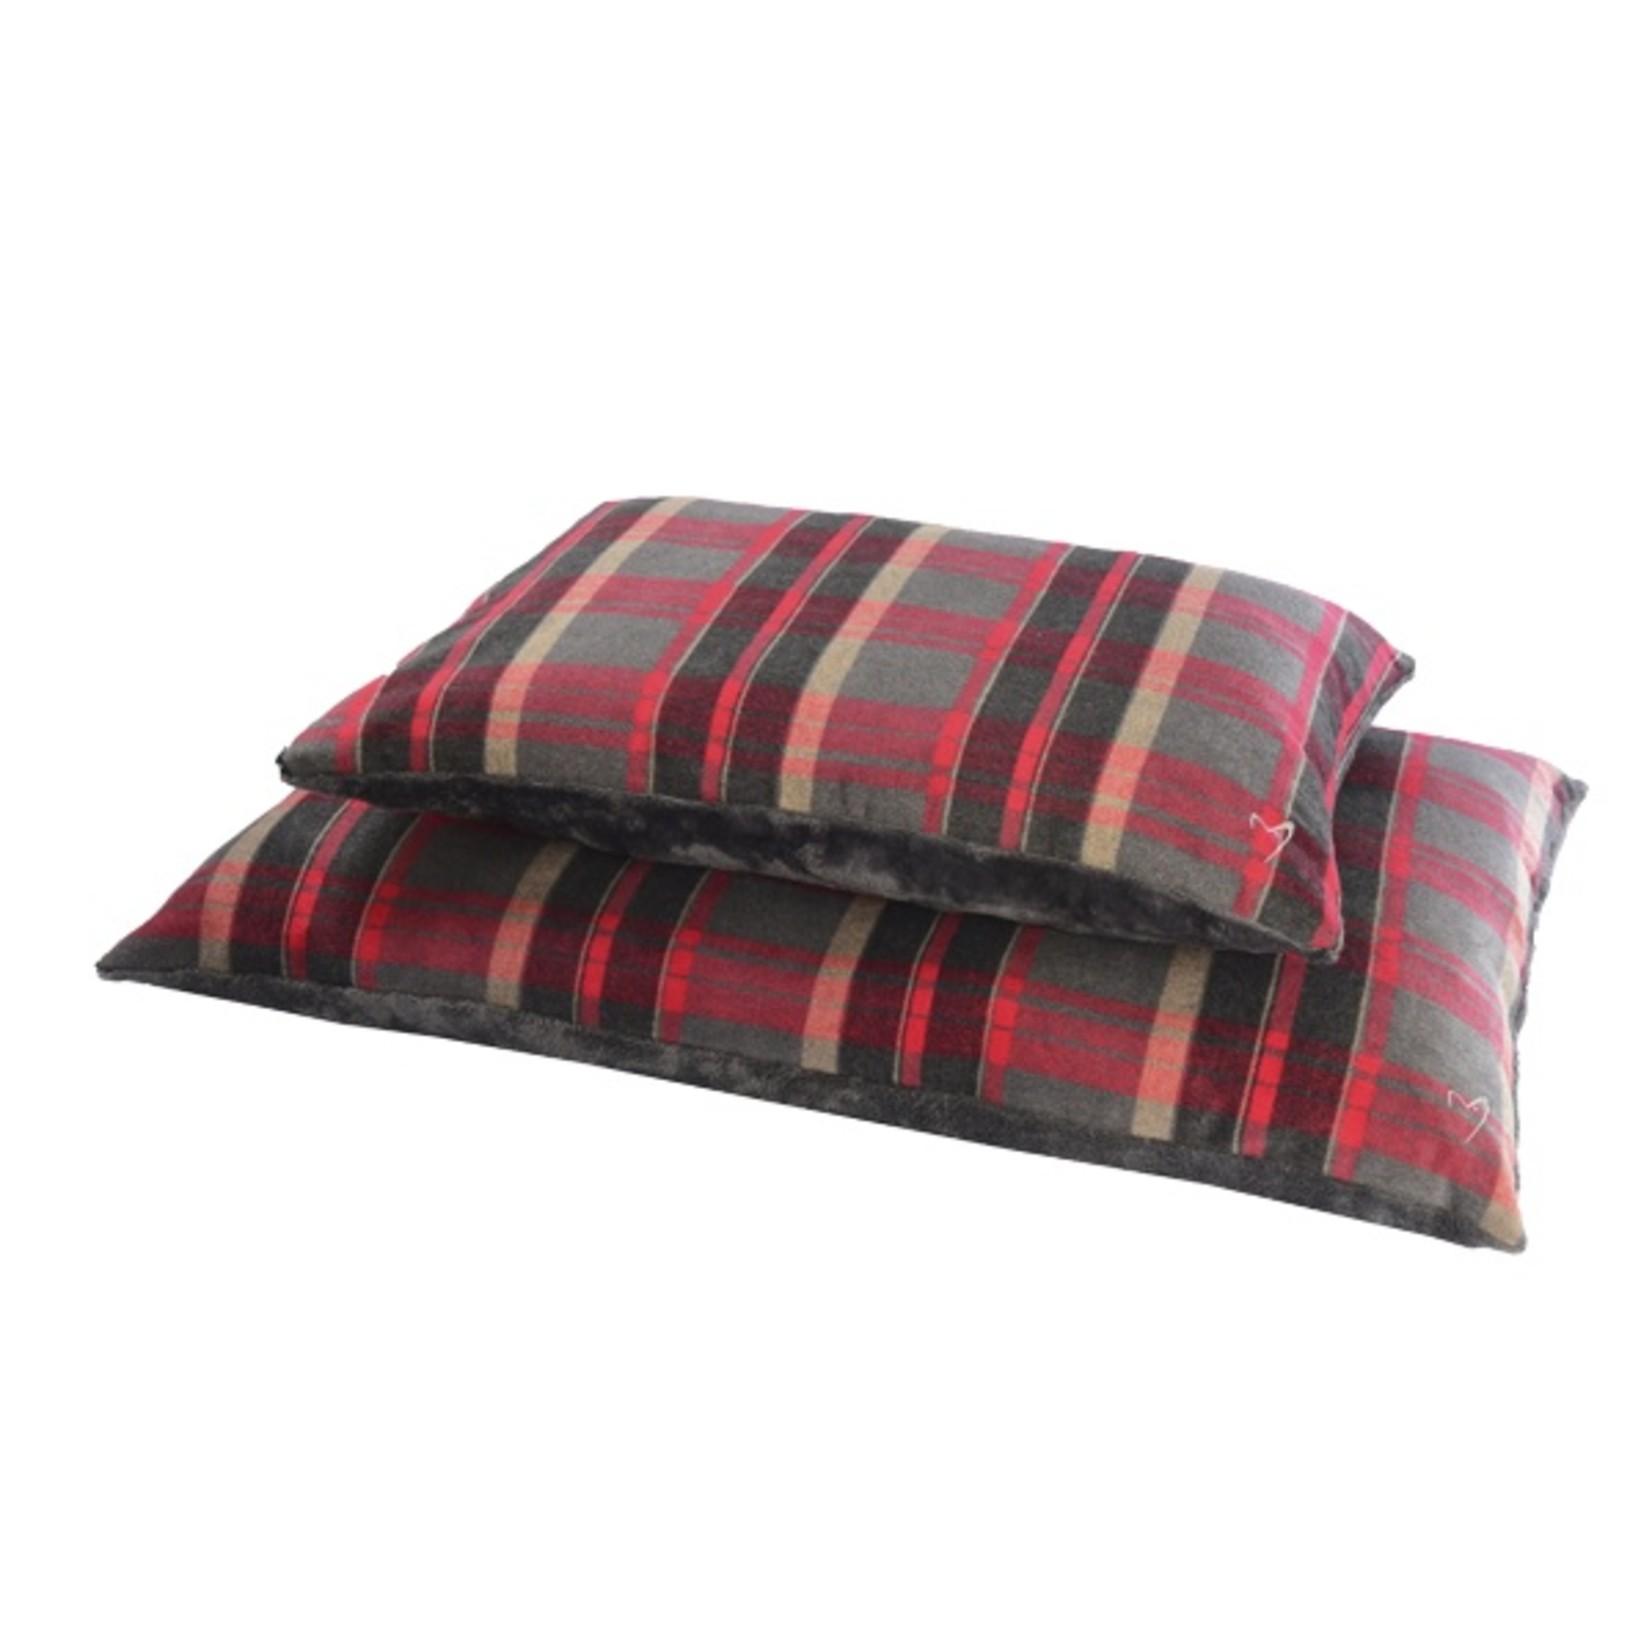 Gor Pets Camden Comfy Cushion Dog Bed, Large 76x117cm